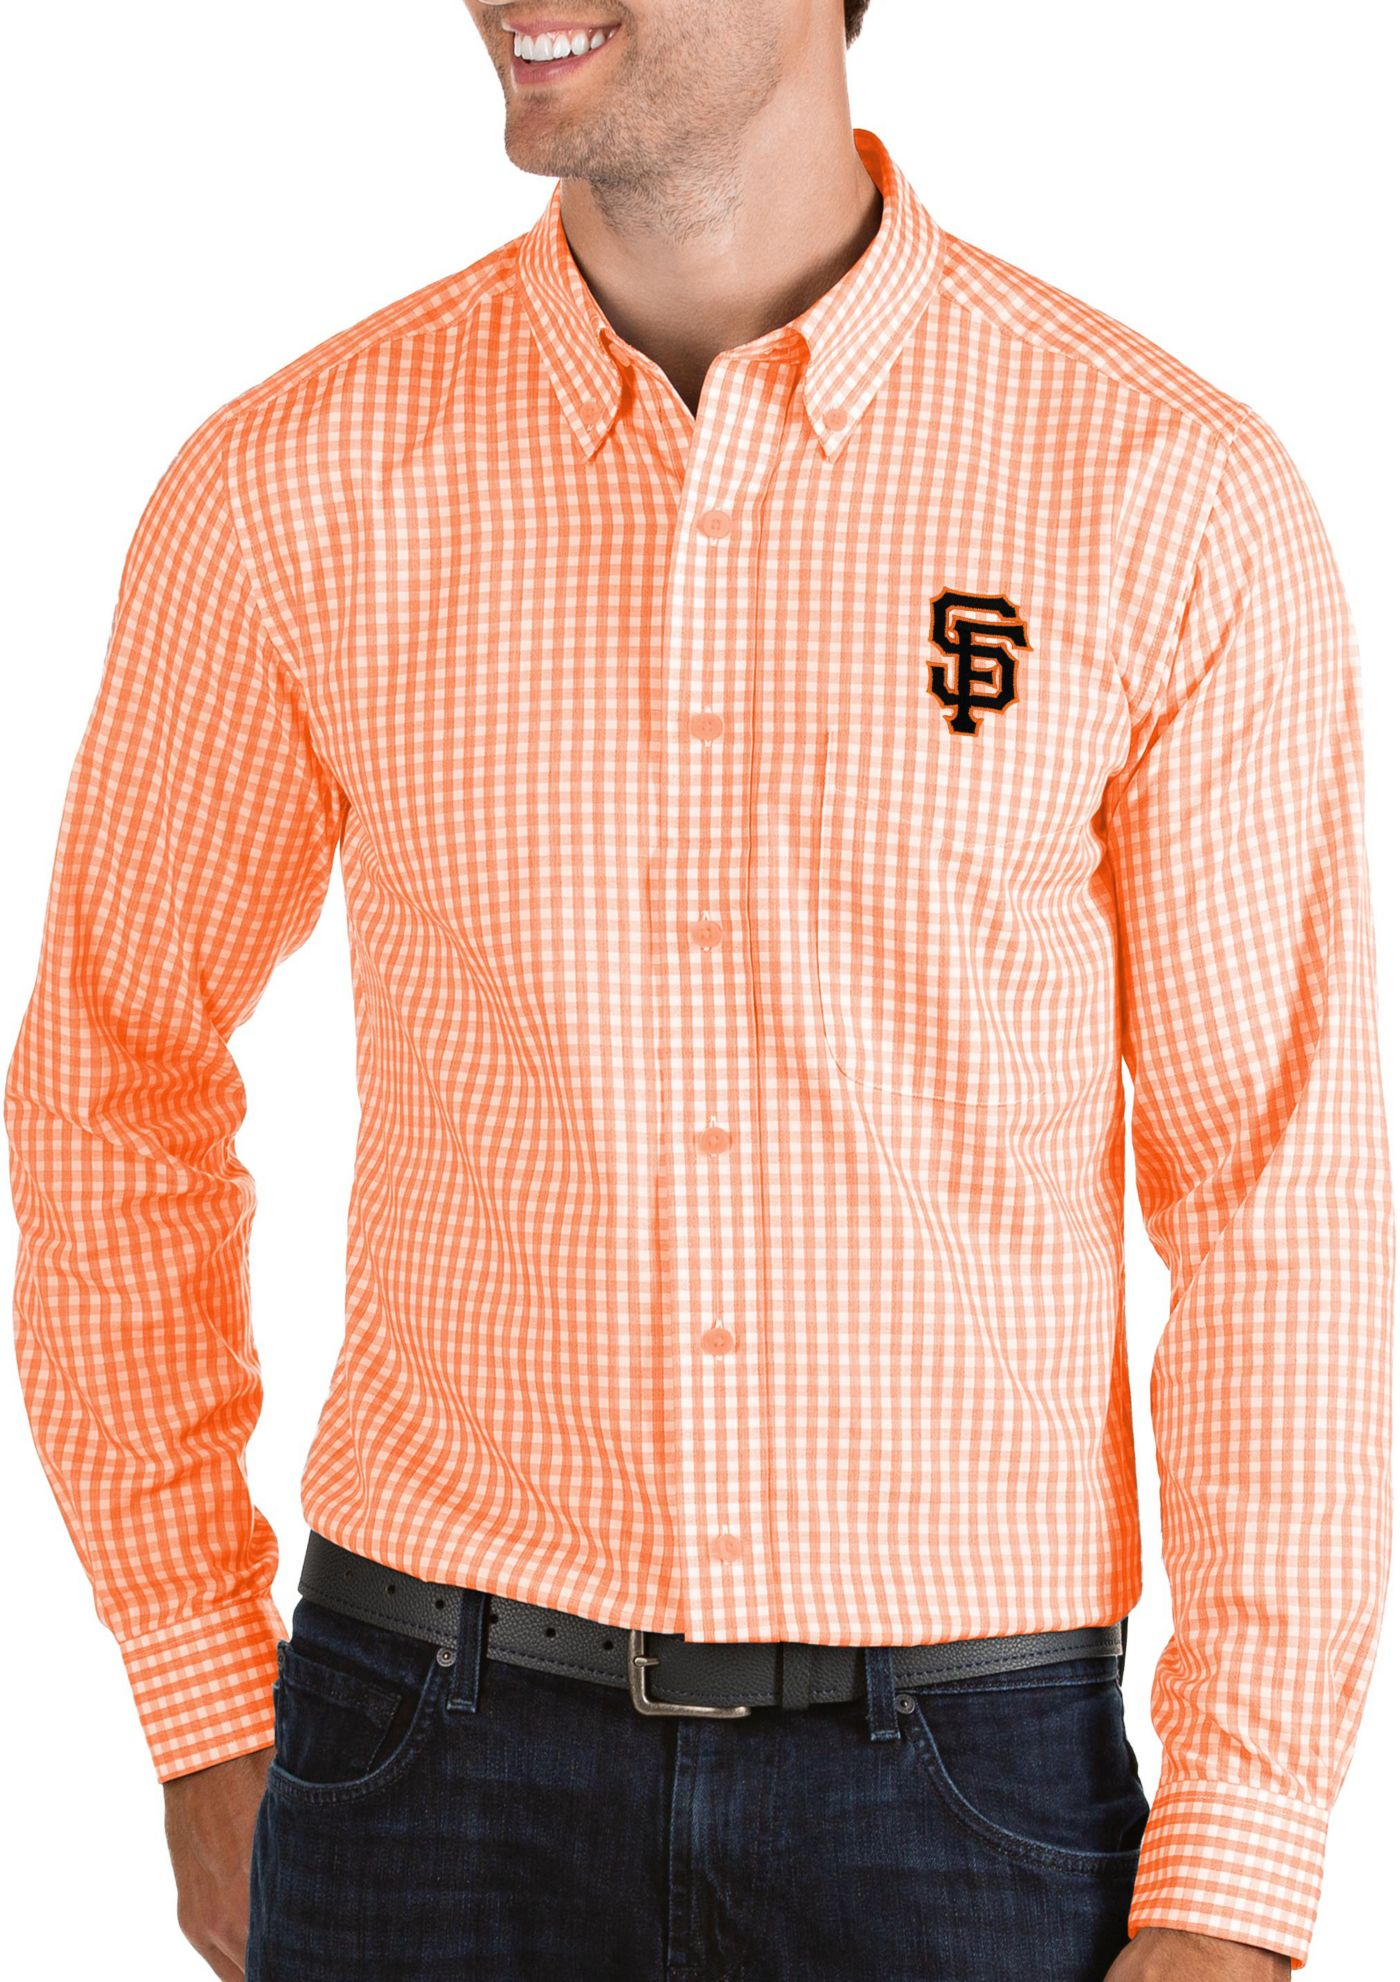 Antigua Men's San Francisco Giants Structure Button-Up Orange Long Sleeve Shirt